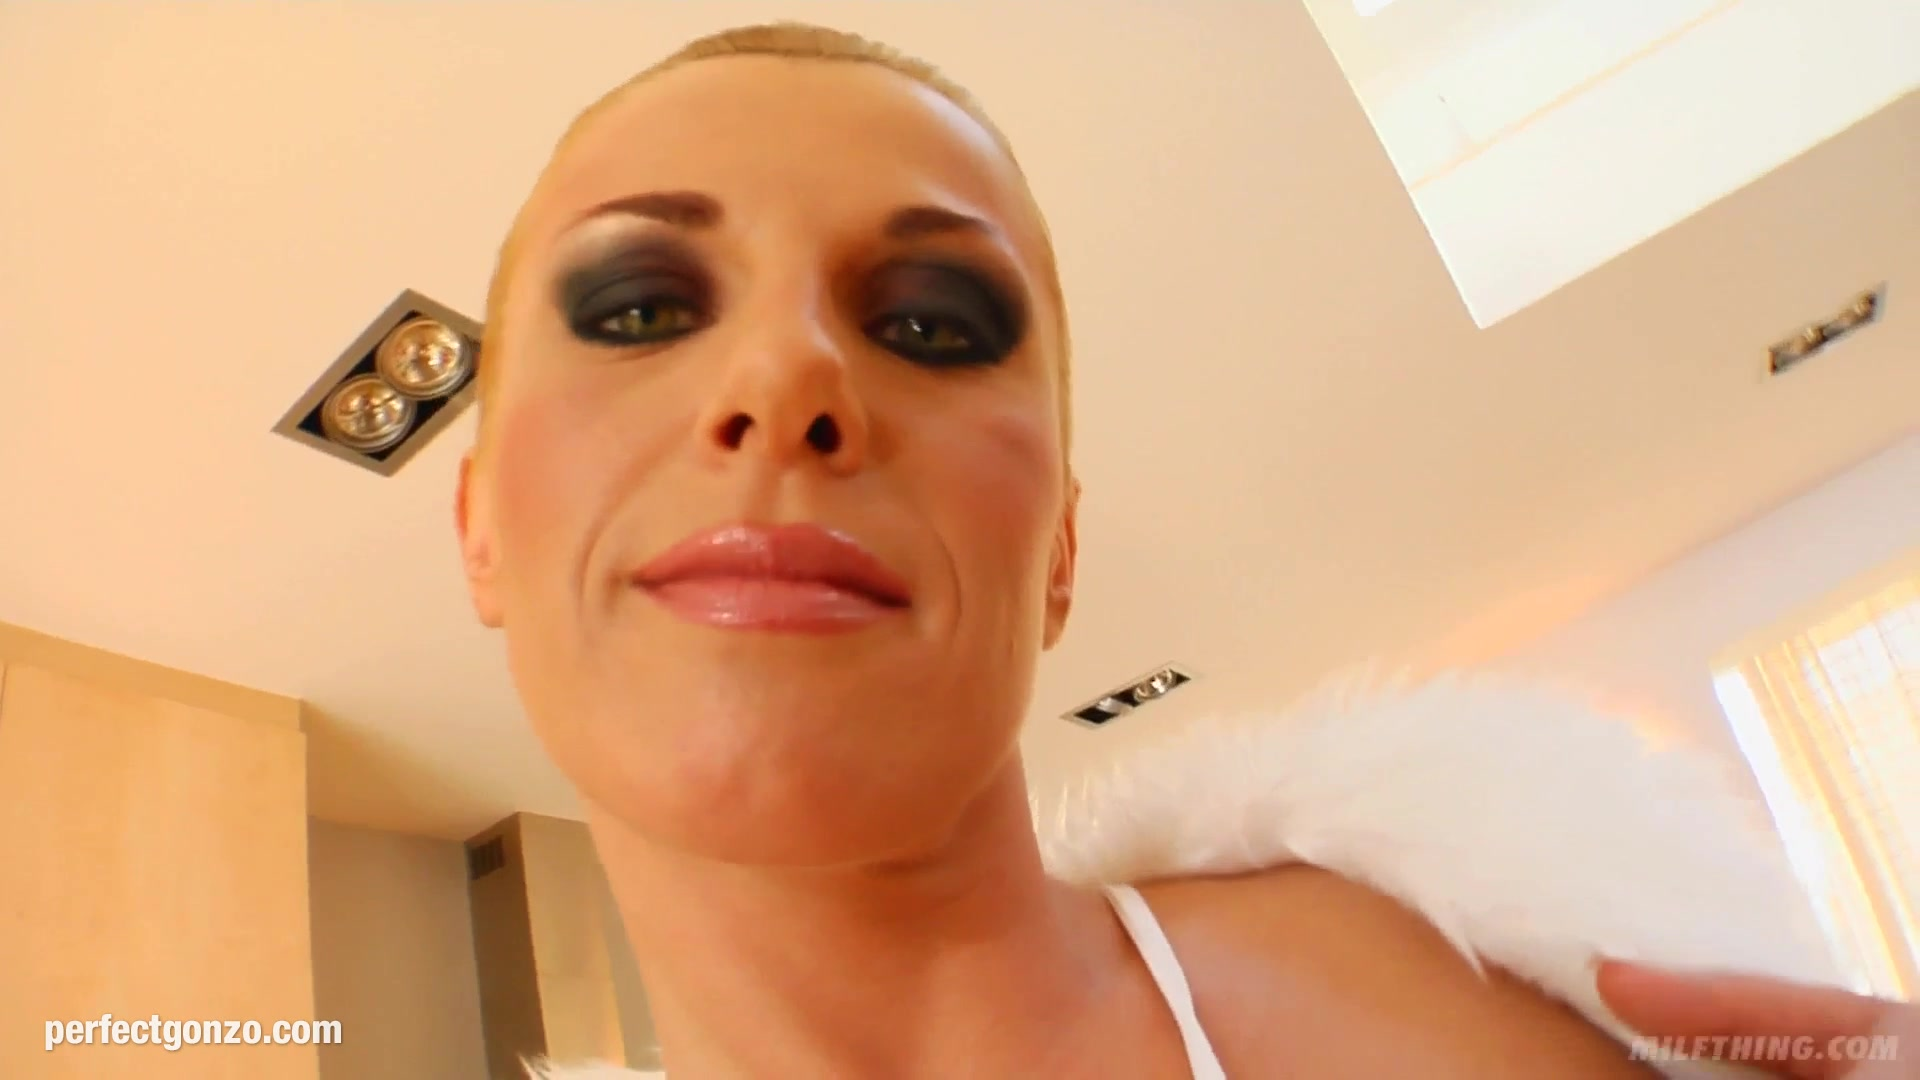 Marisha ray matthew mercer dating sites Porn Pics & Movies